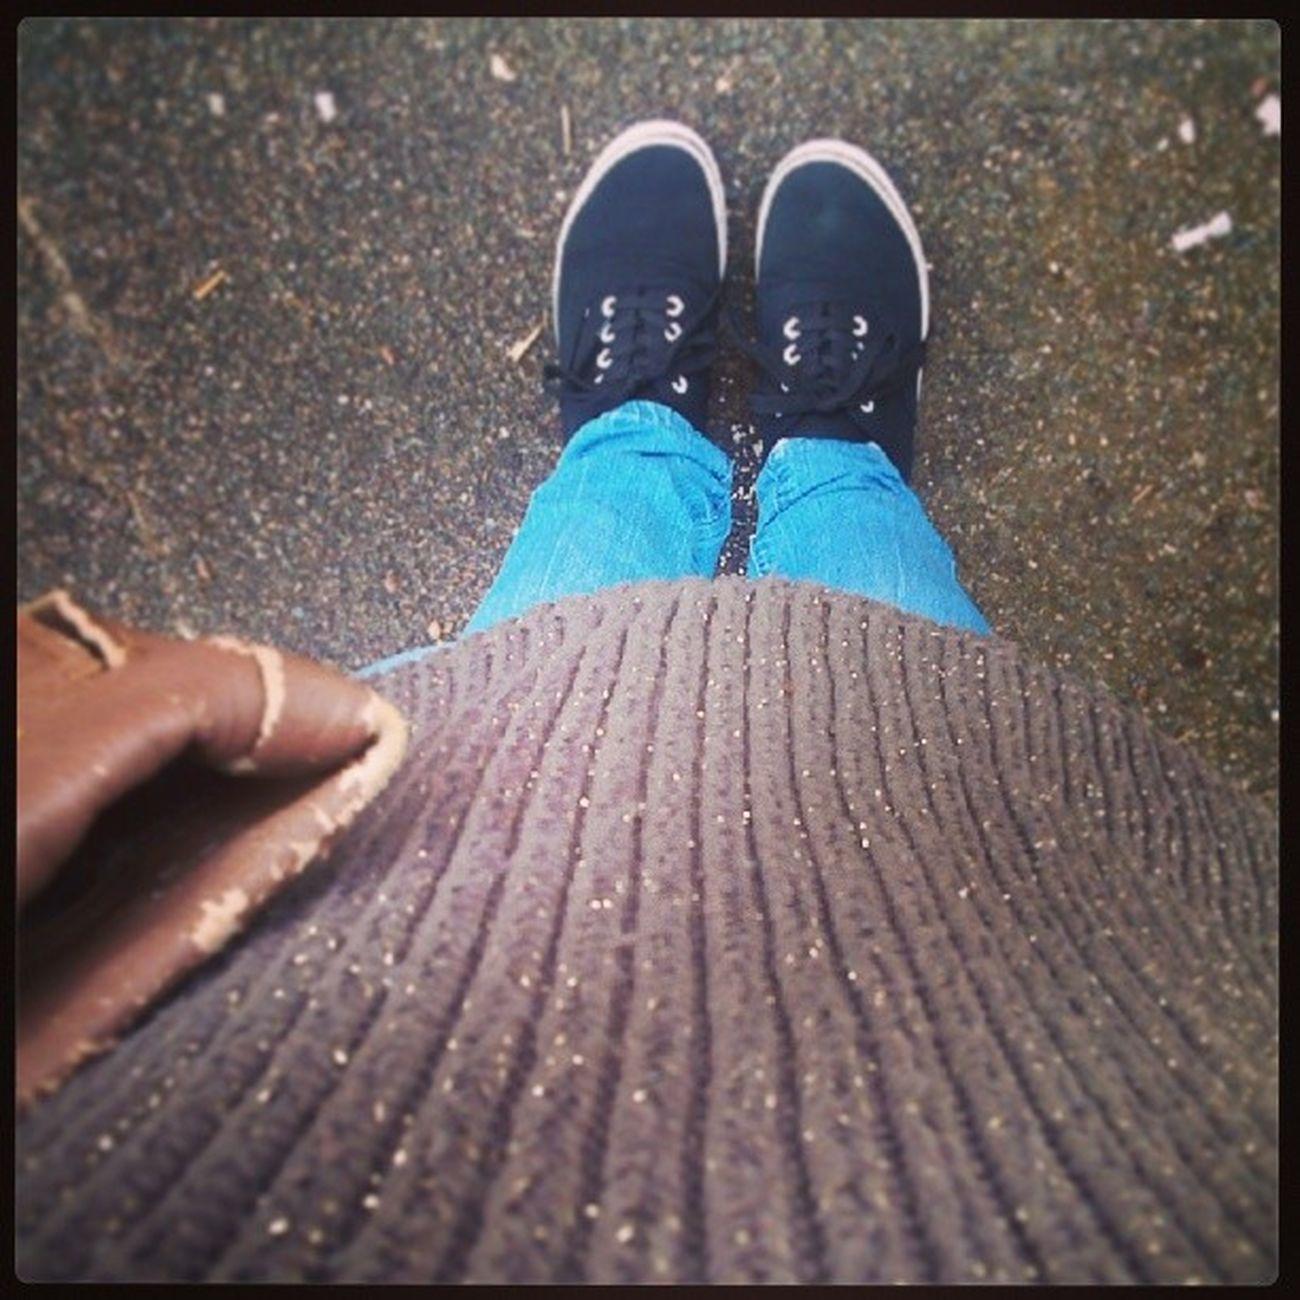 Ourfitforschool School Clothes Jeans Nice Cool Shoes Pullover Rain Fashion Mode Followers Followforfollow